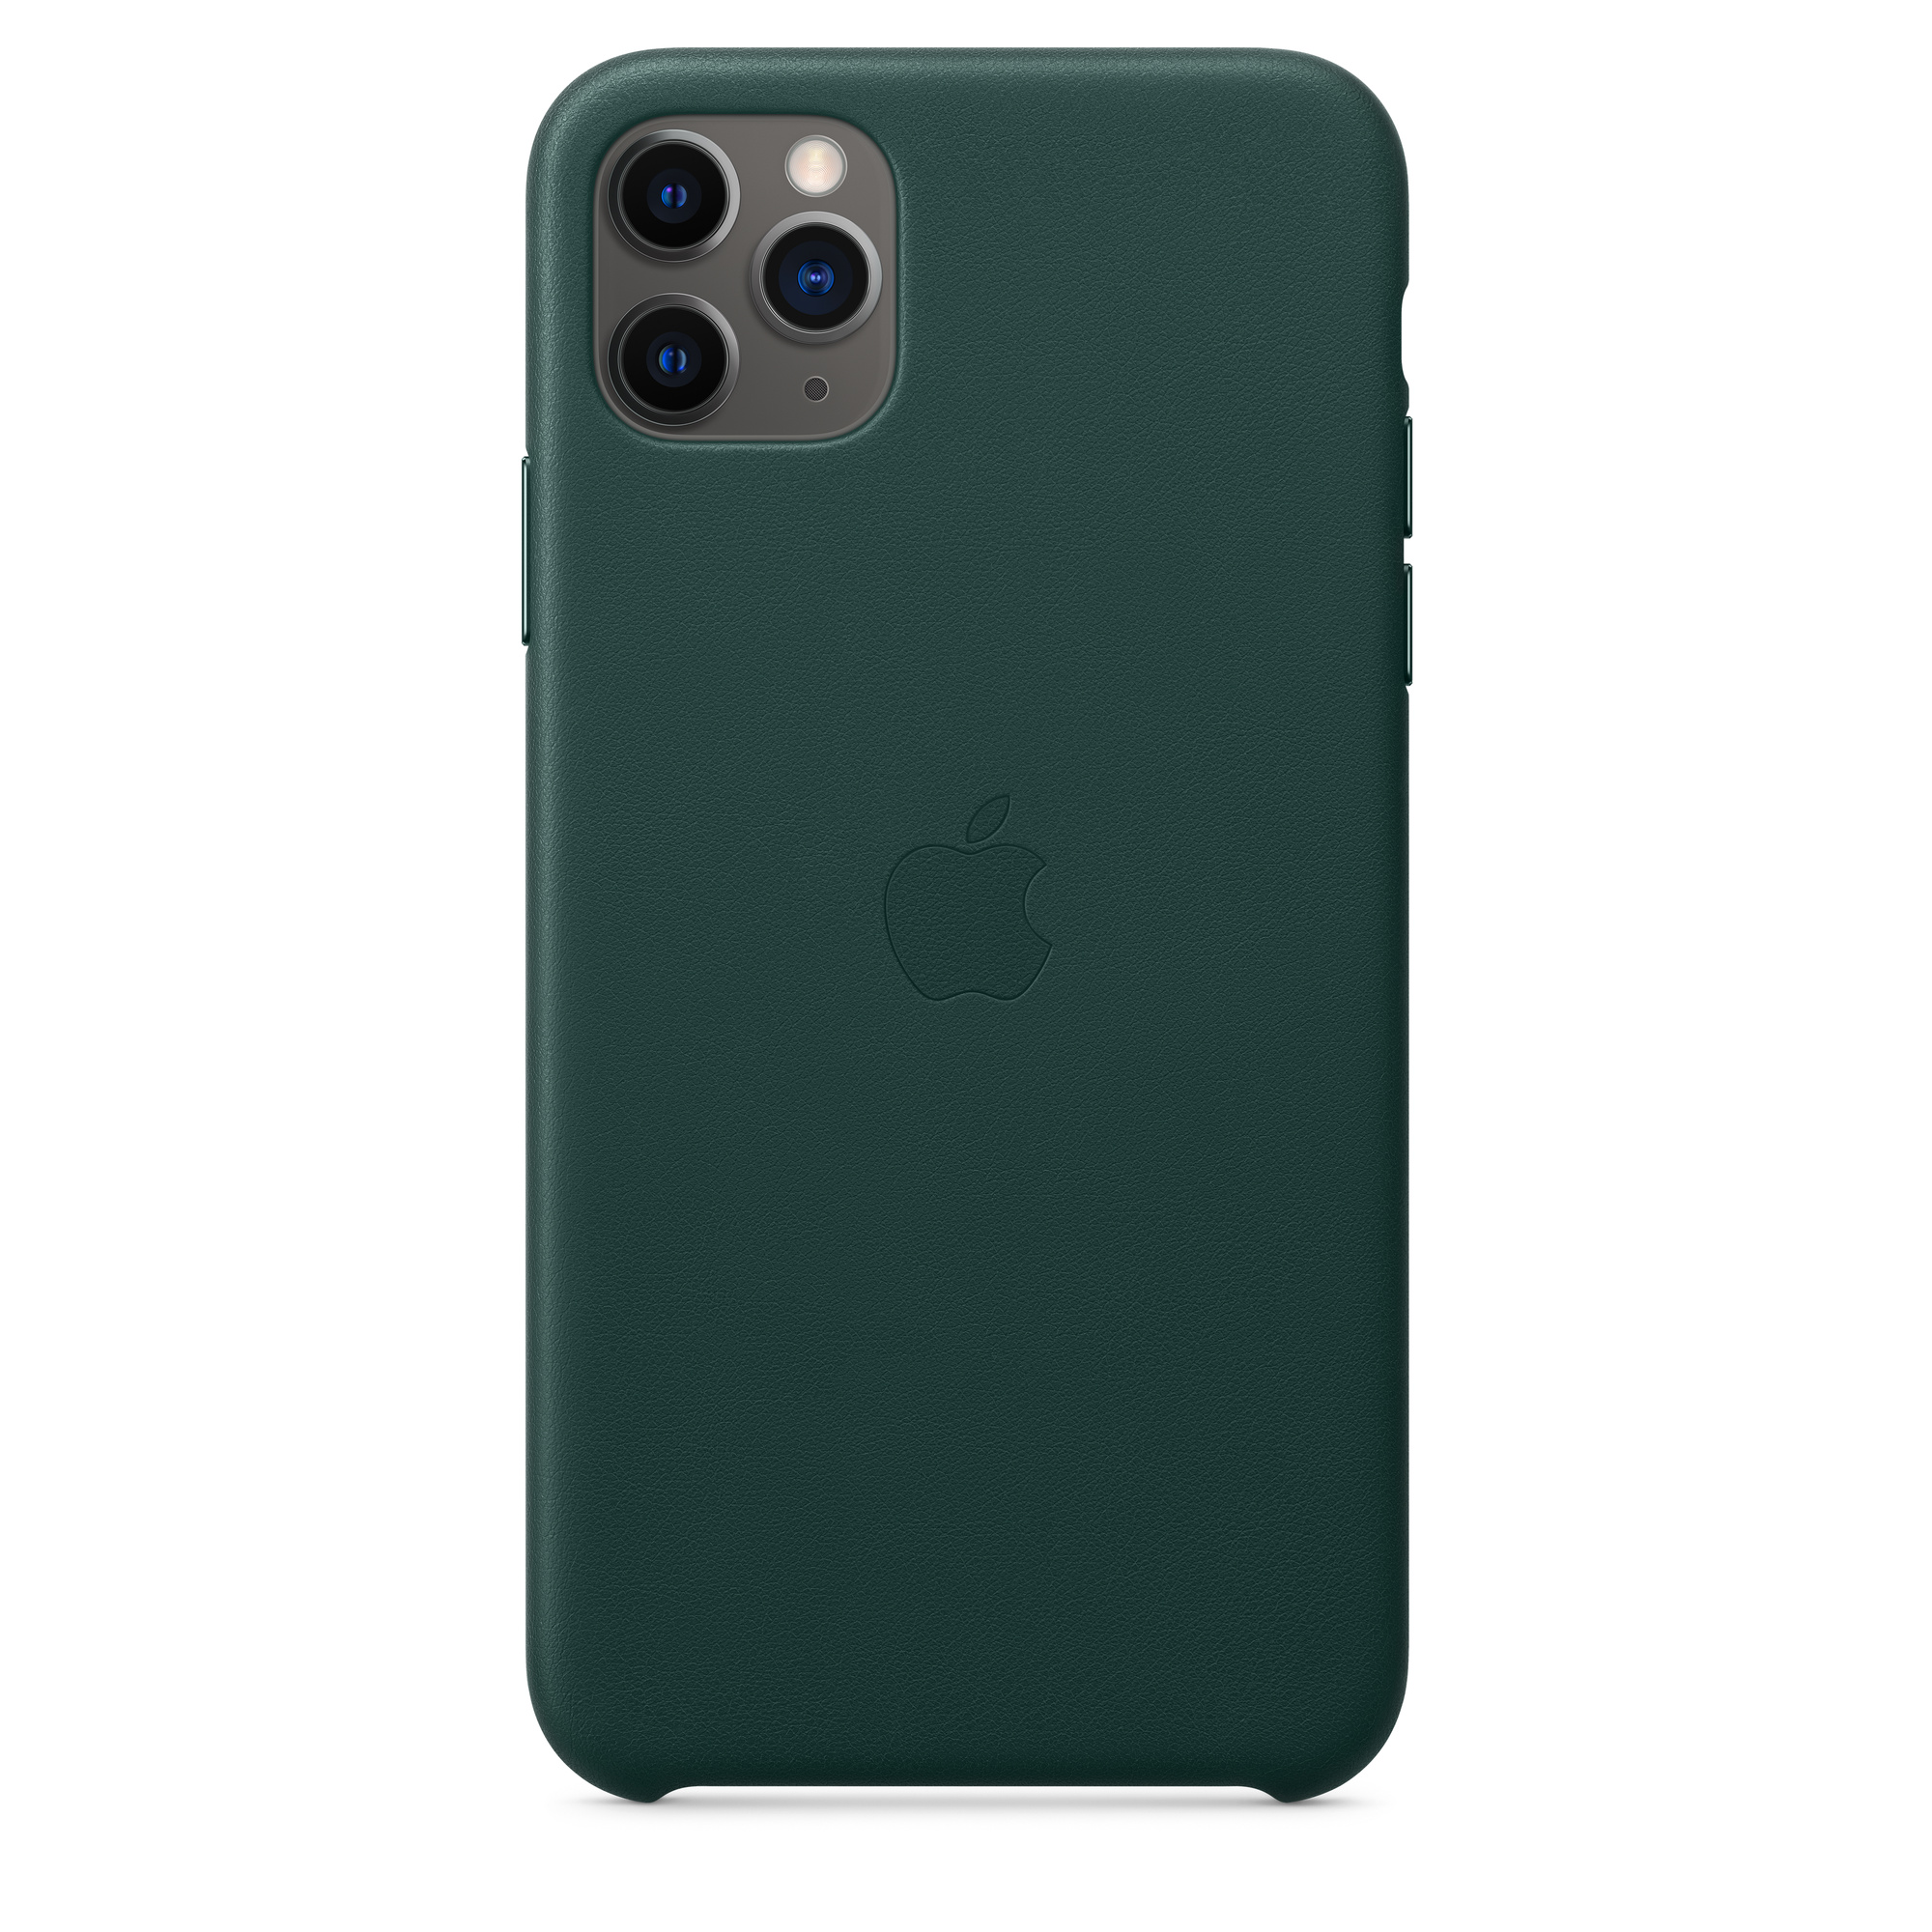 Midnight Green Iphone 11 Pro Max Case